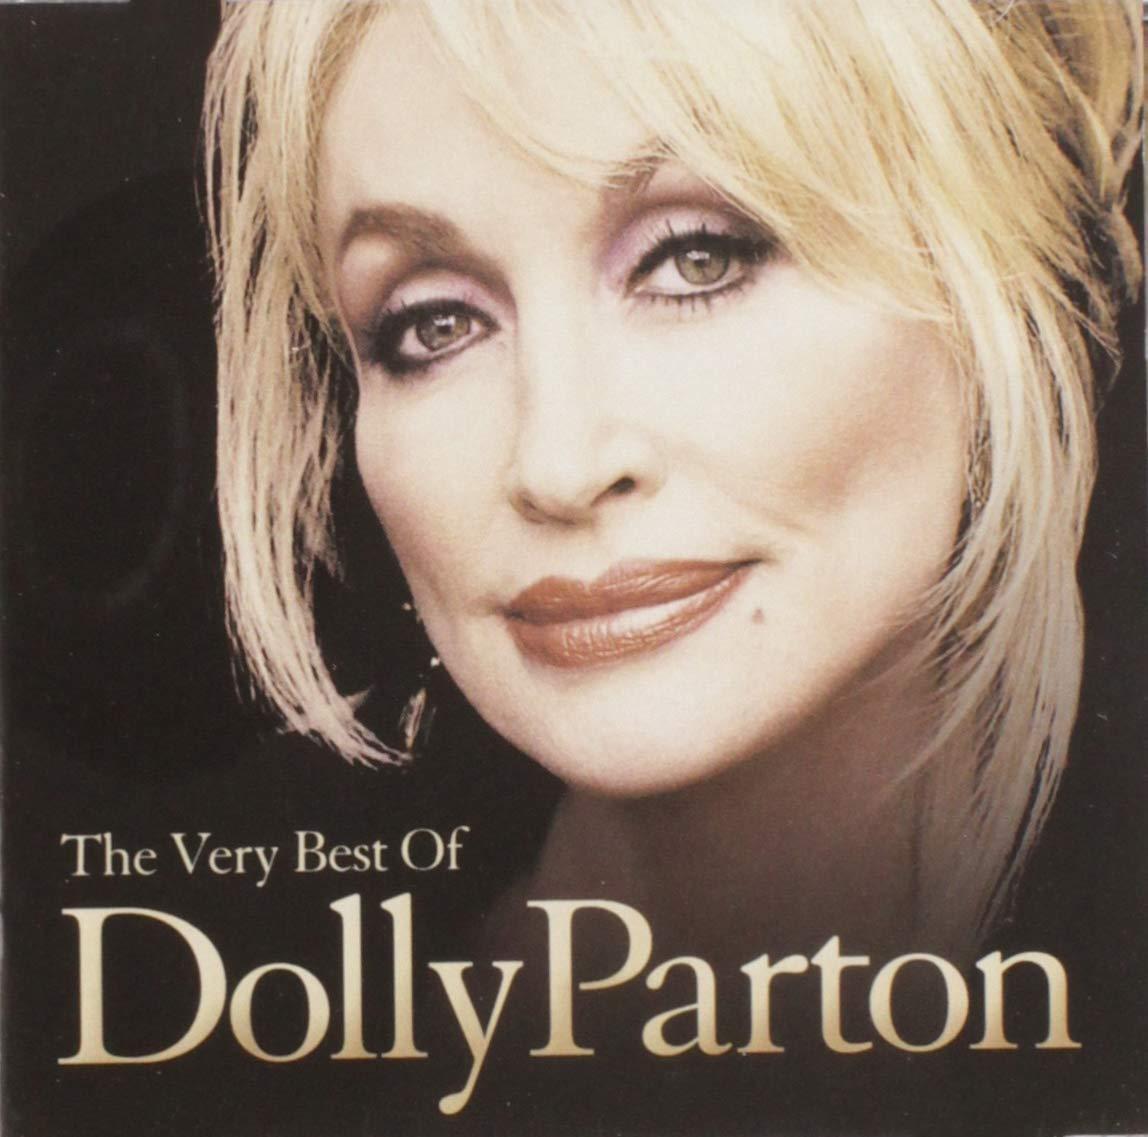 The Very Best of Parton Overseas parallel import regular item depot Dolly